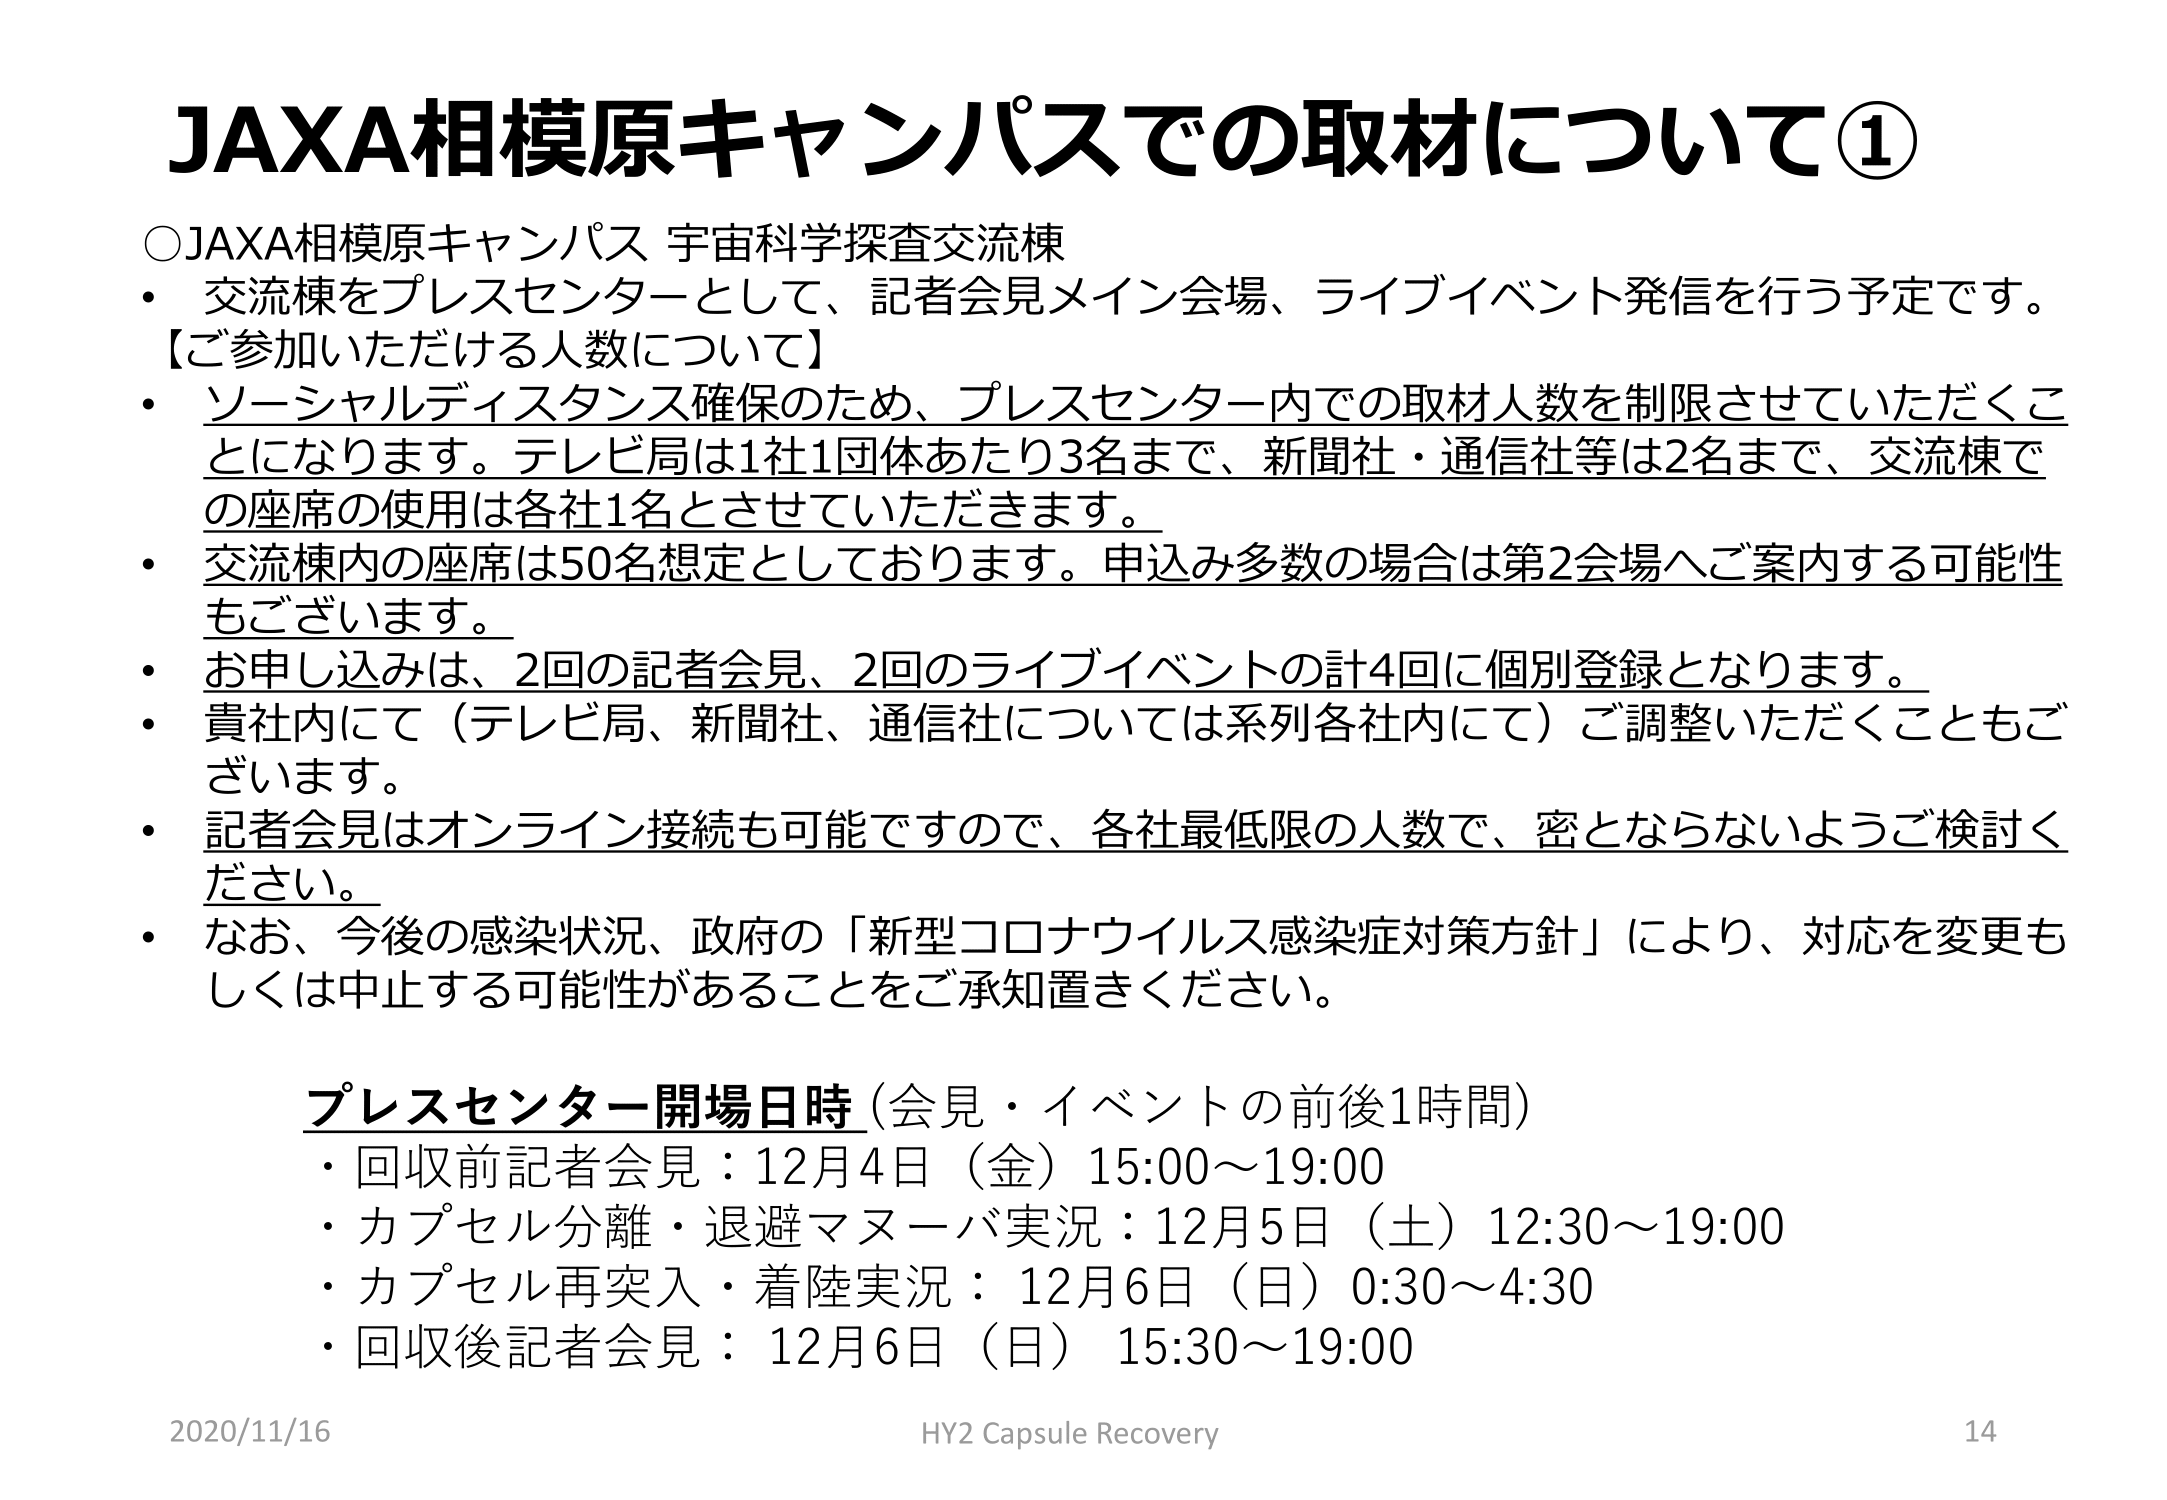 f:id:Imamura:20201117222329p:plain